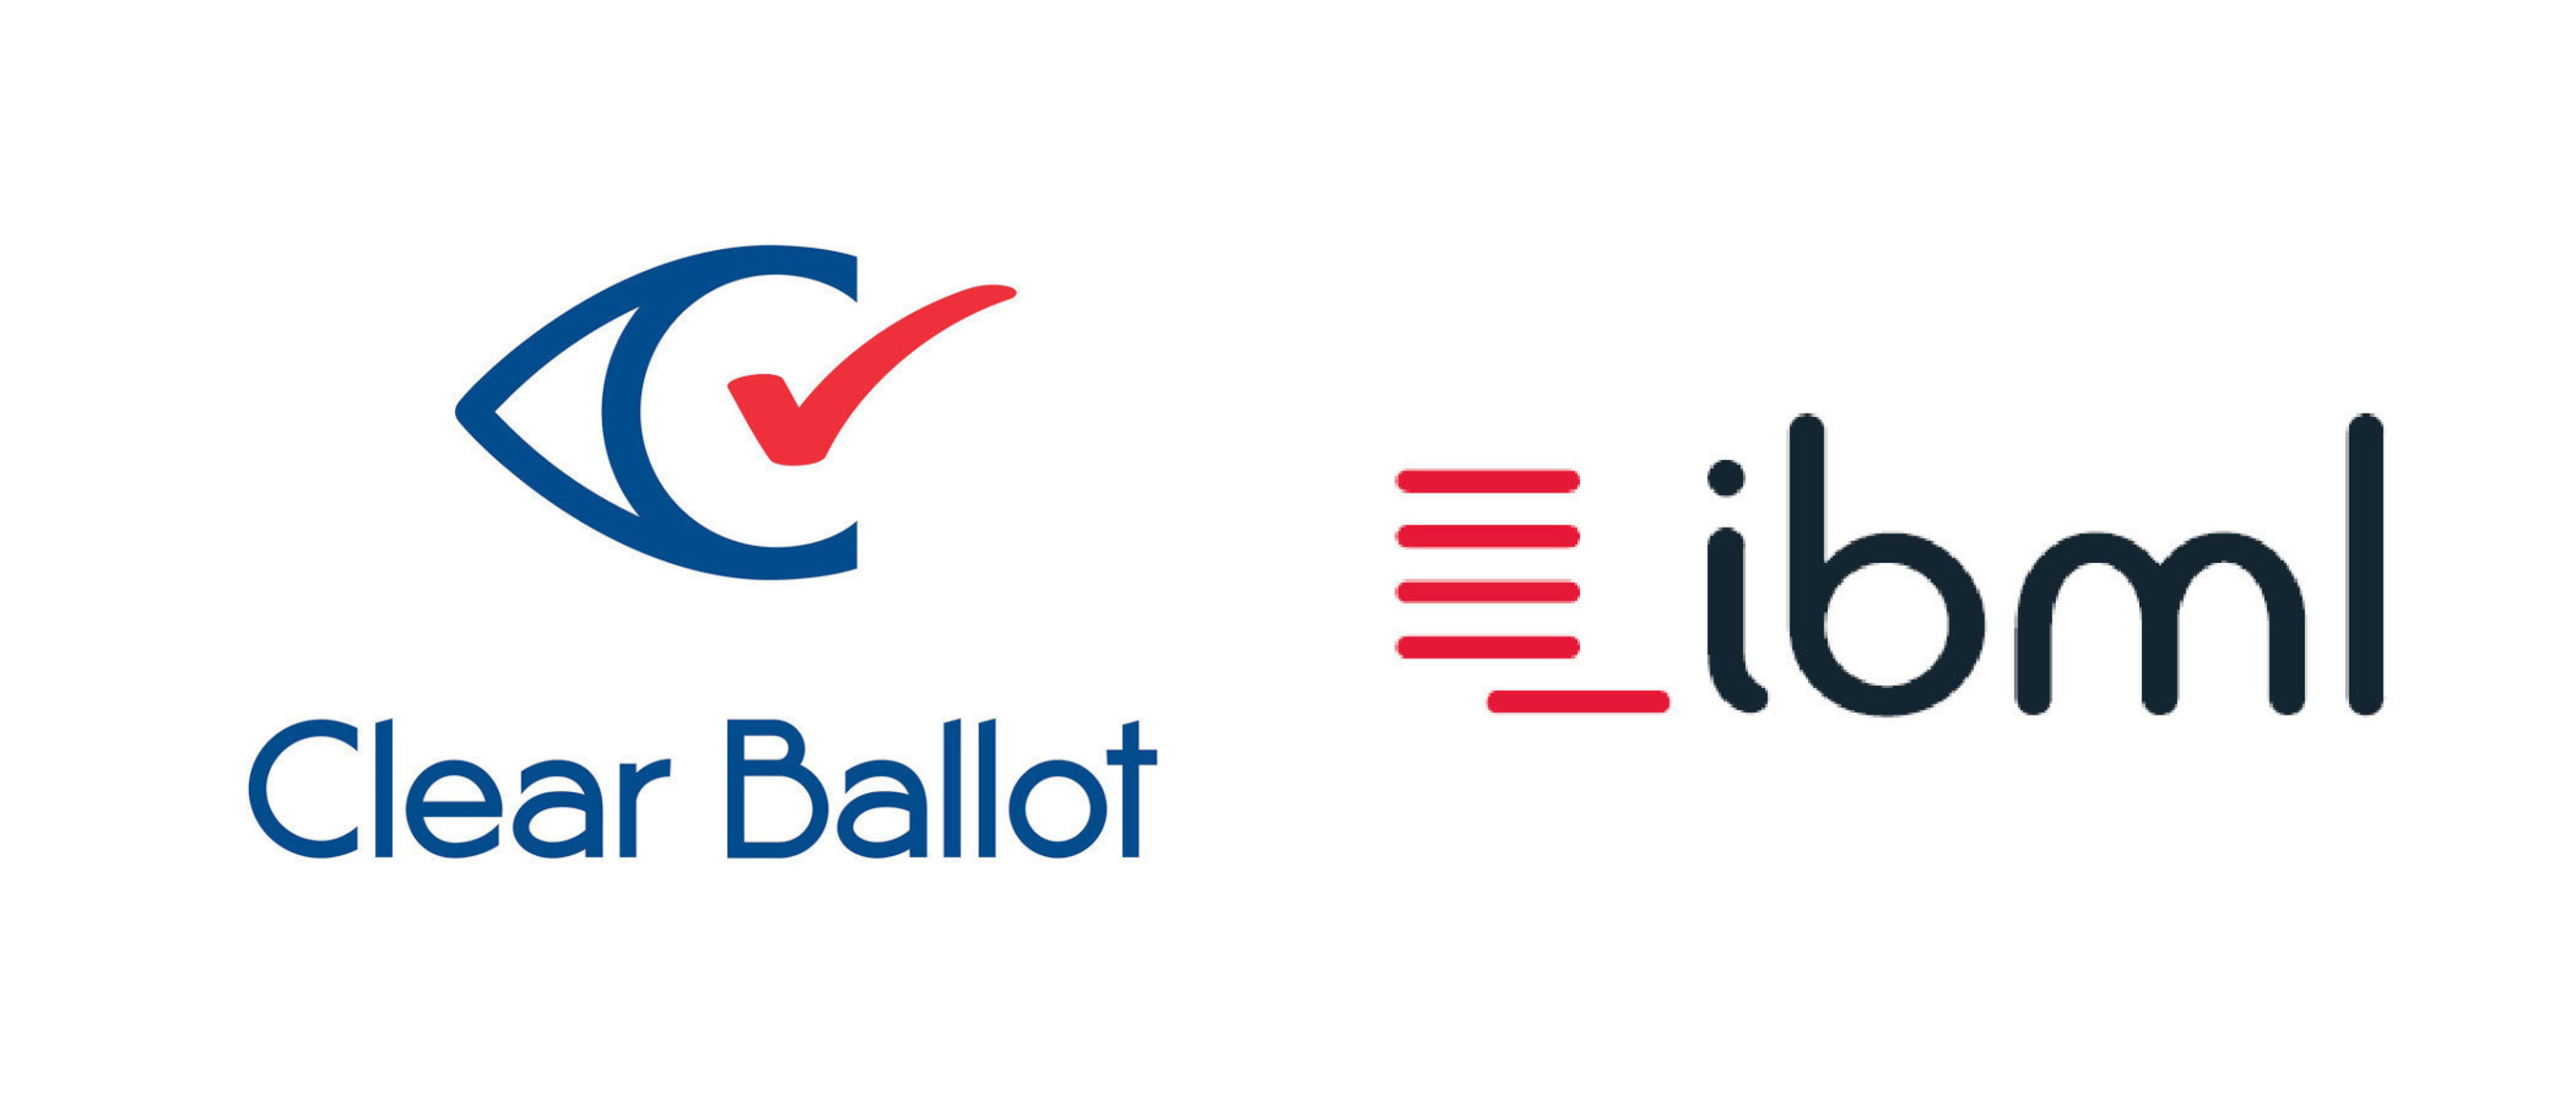 Clear_Ballot_ibml_Logos